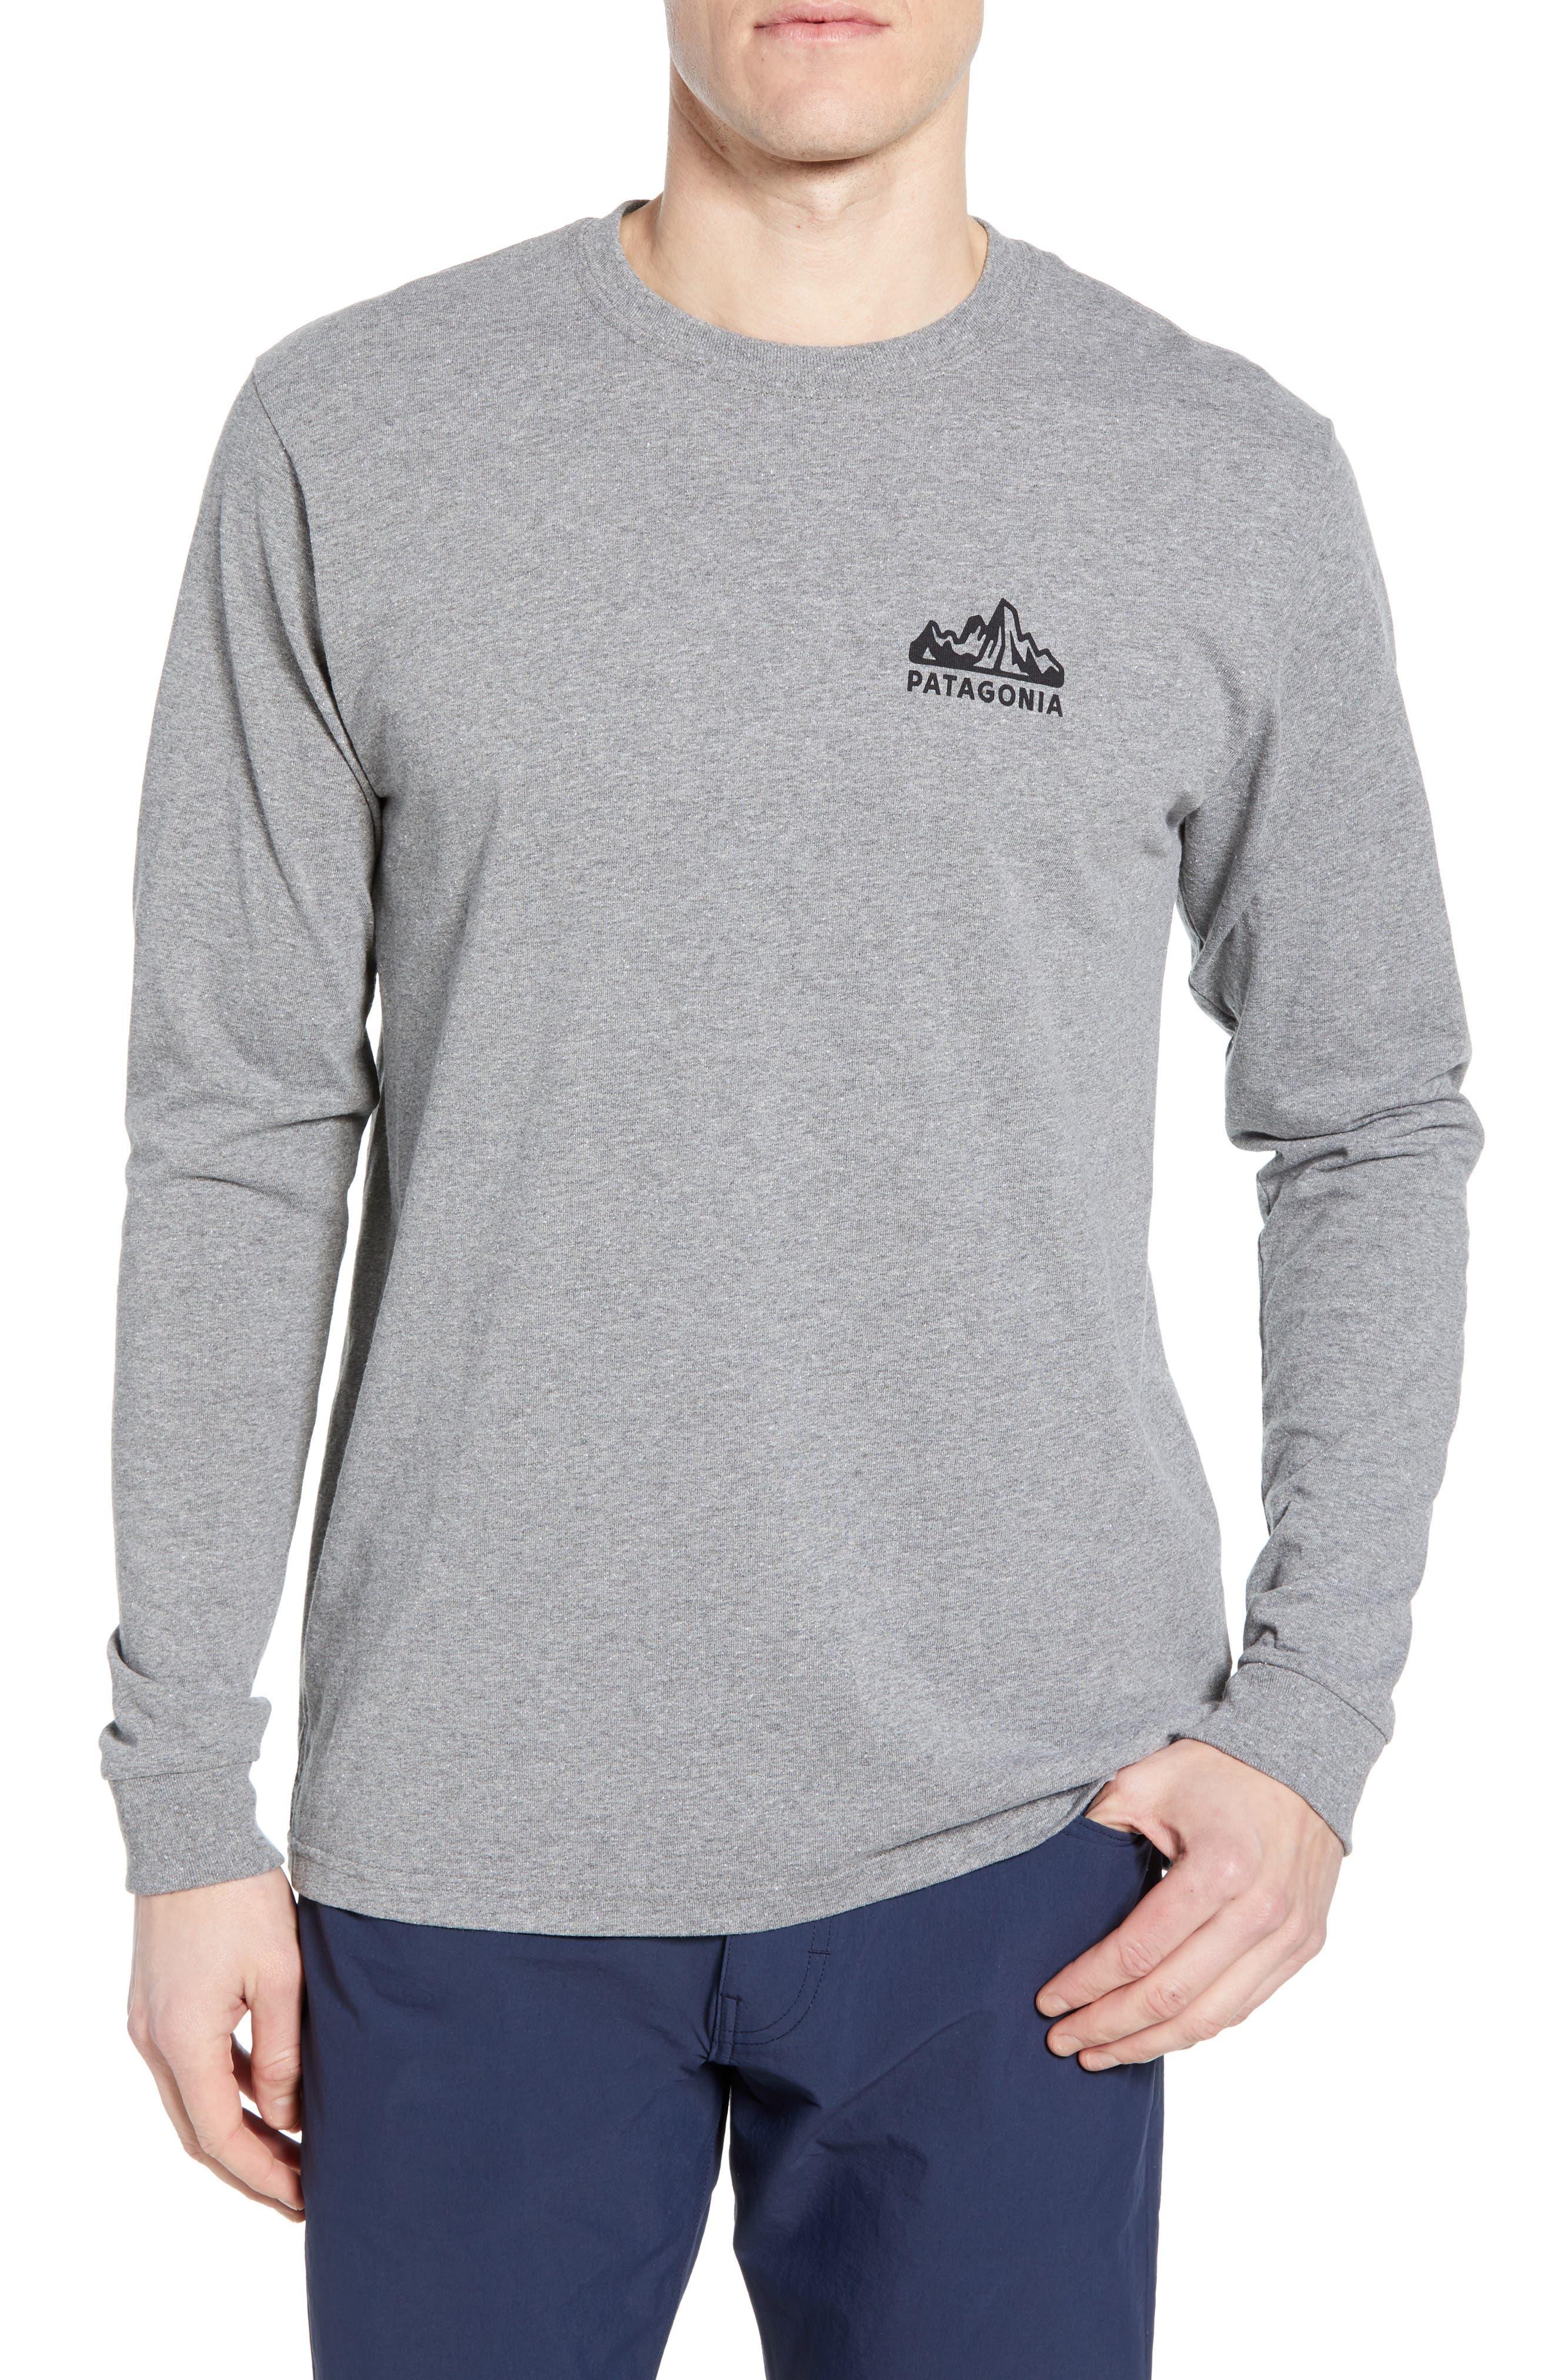 Fitz Roy Scope Long Sleeve Responsibili-Tee T-Shirt,                             Main thumbnail 1, color,                             GRAVEL HEATHER